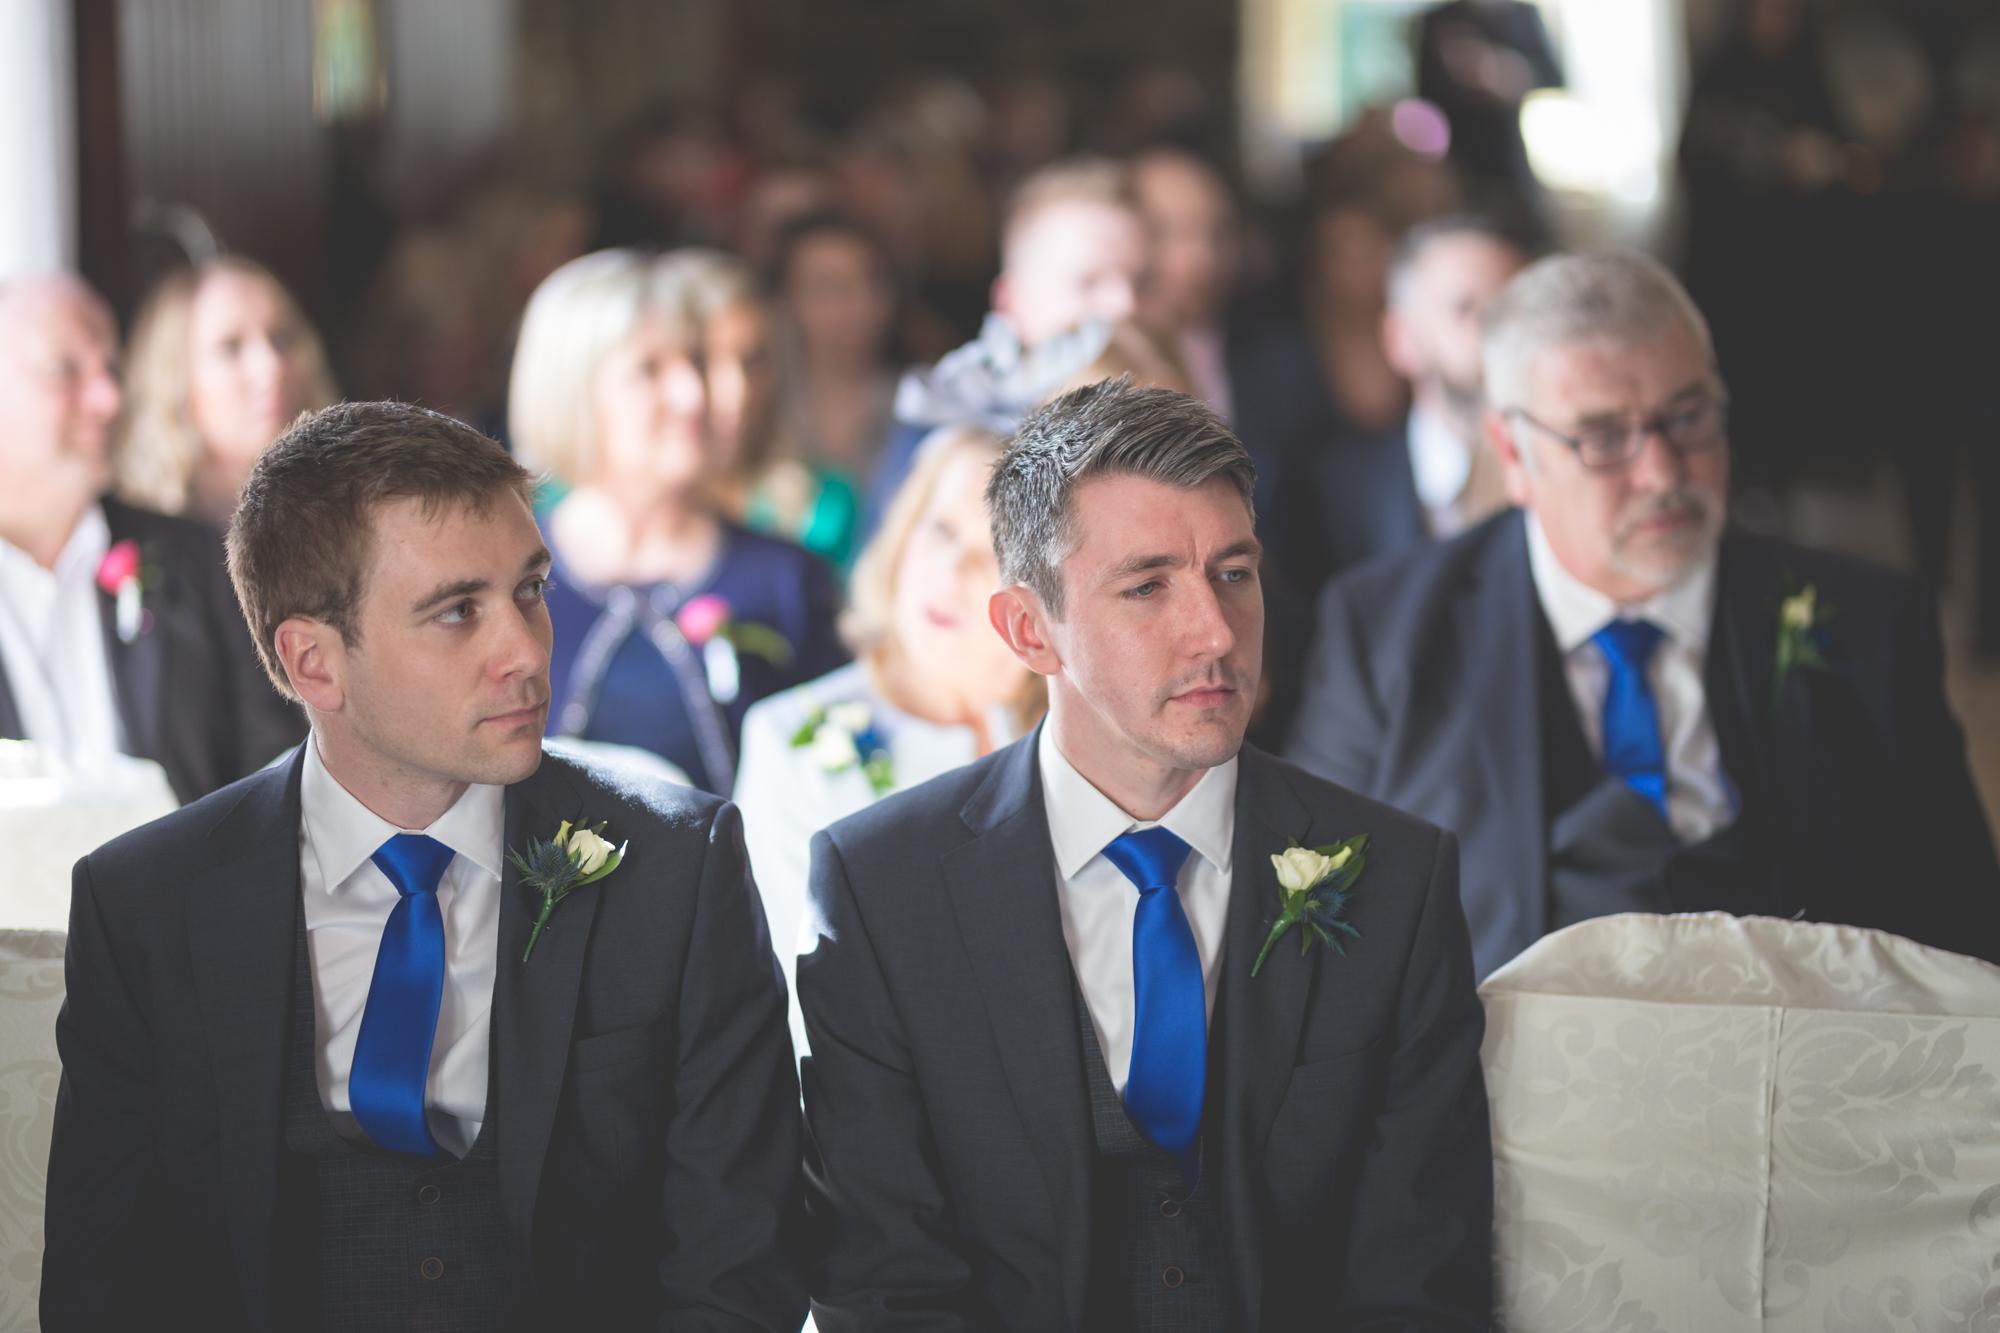 Steve_Emma_Ceremony-112.jpg